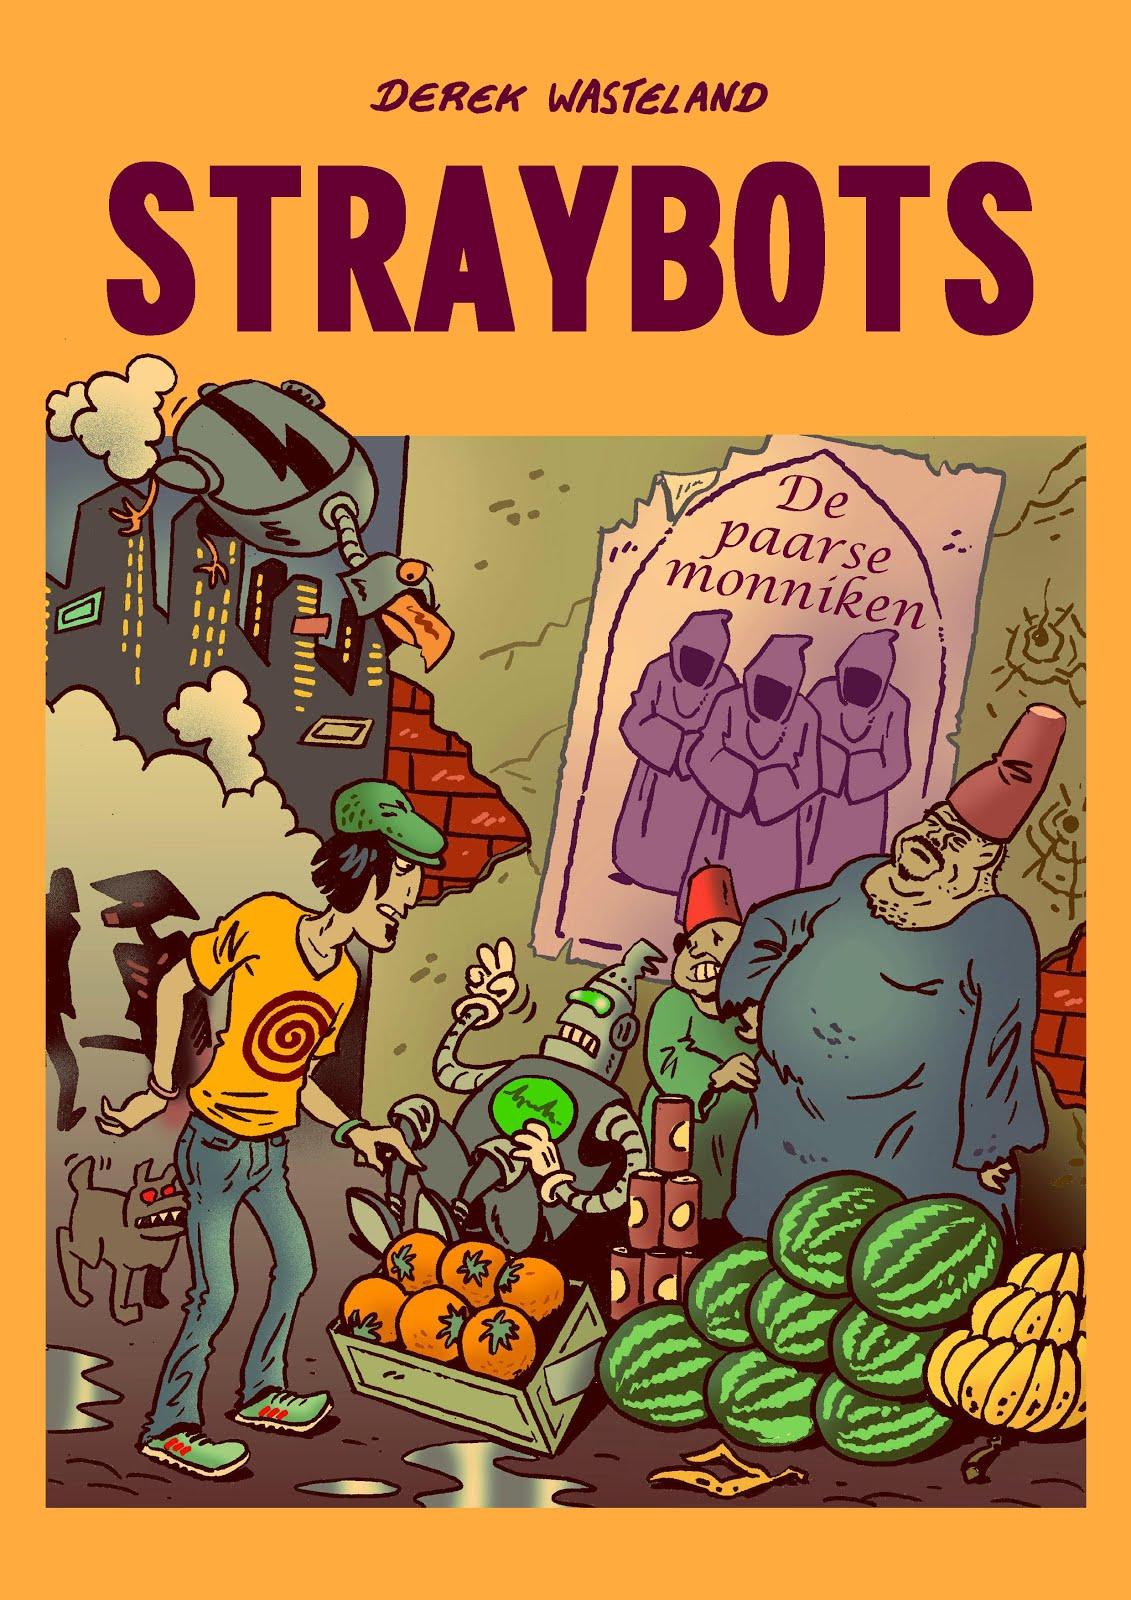 Straybots2: De paarse monniken